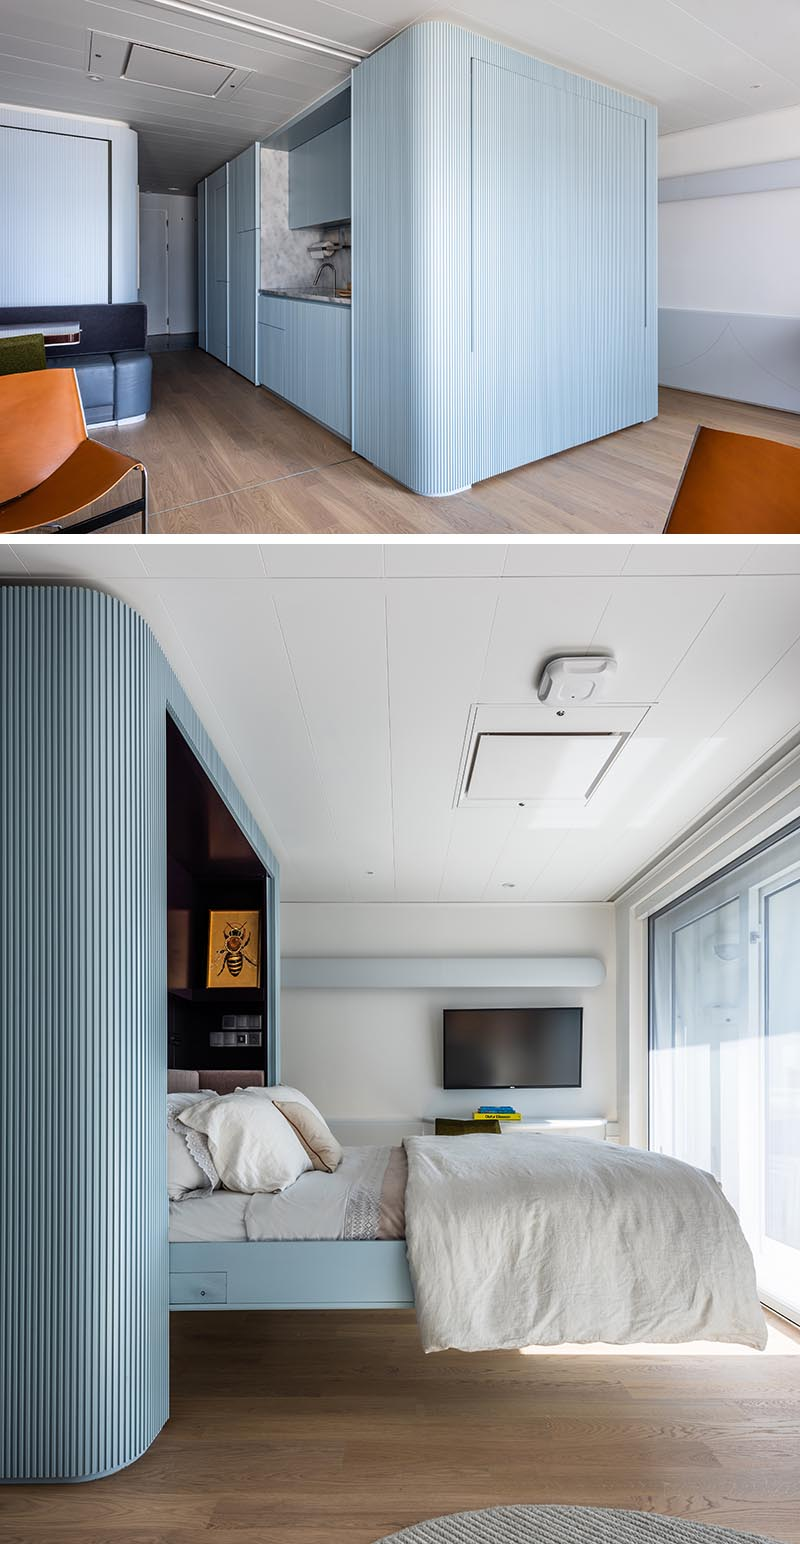 A murphy bed is hidden within a blue textured wall.